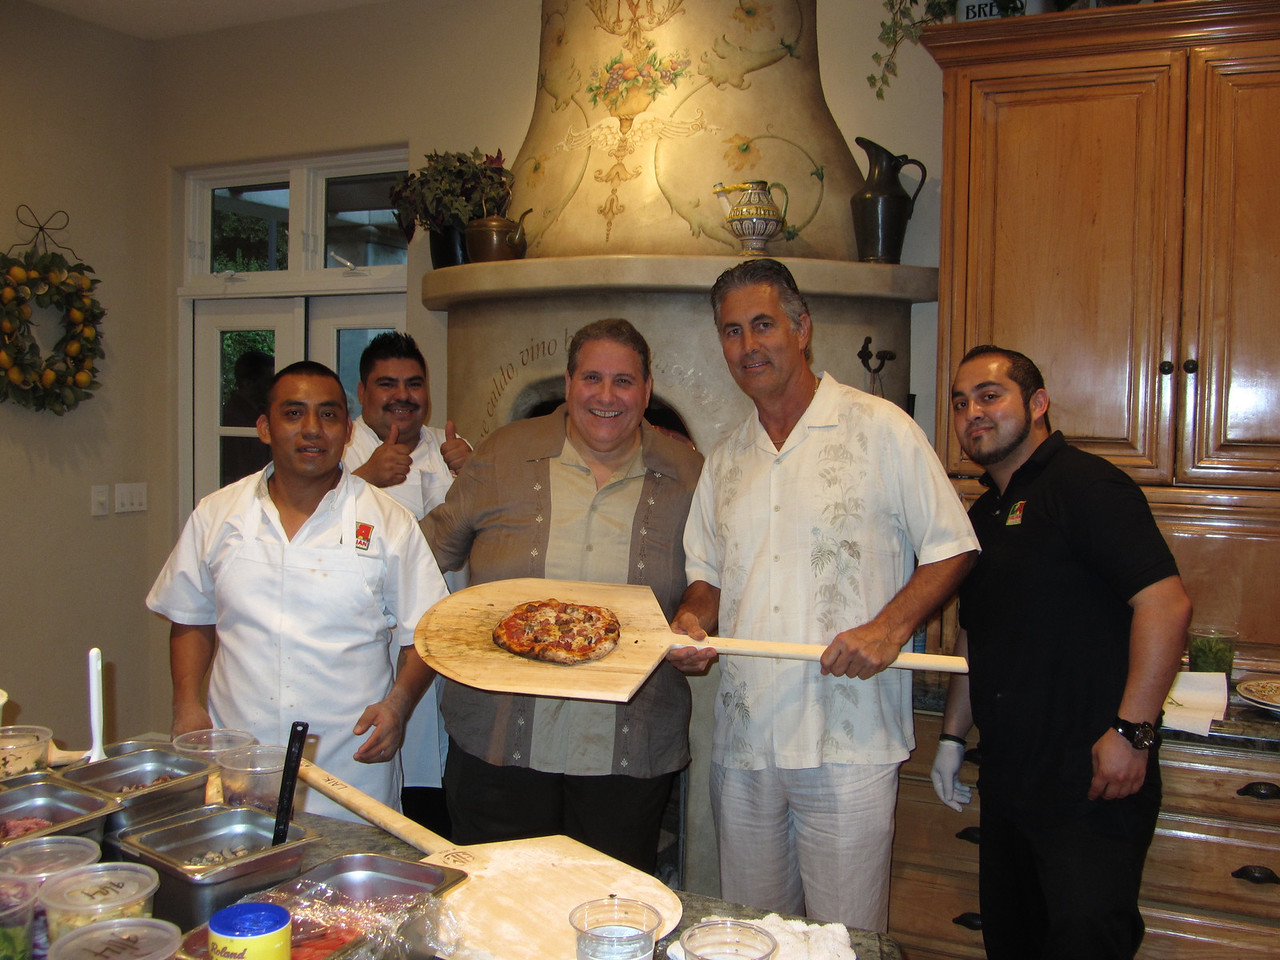 Former Rams Quarterback Vince Ferragamo posing with staff